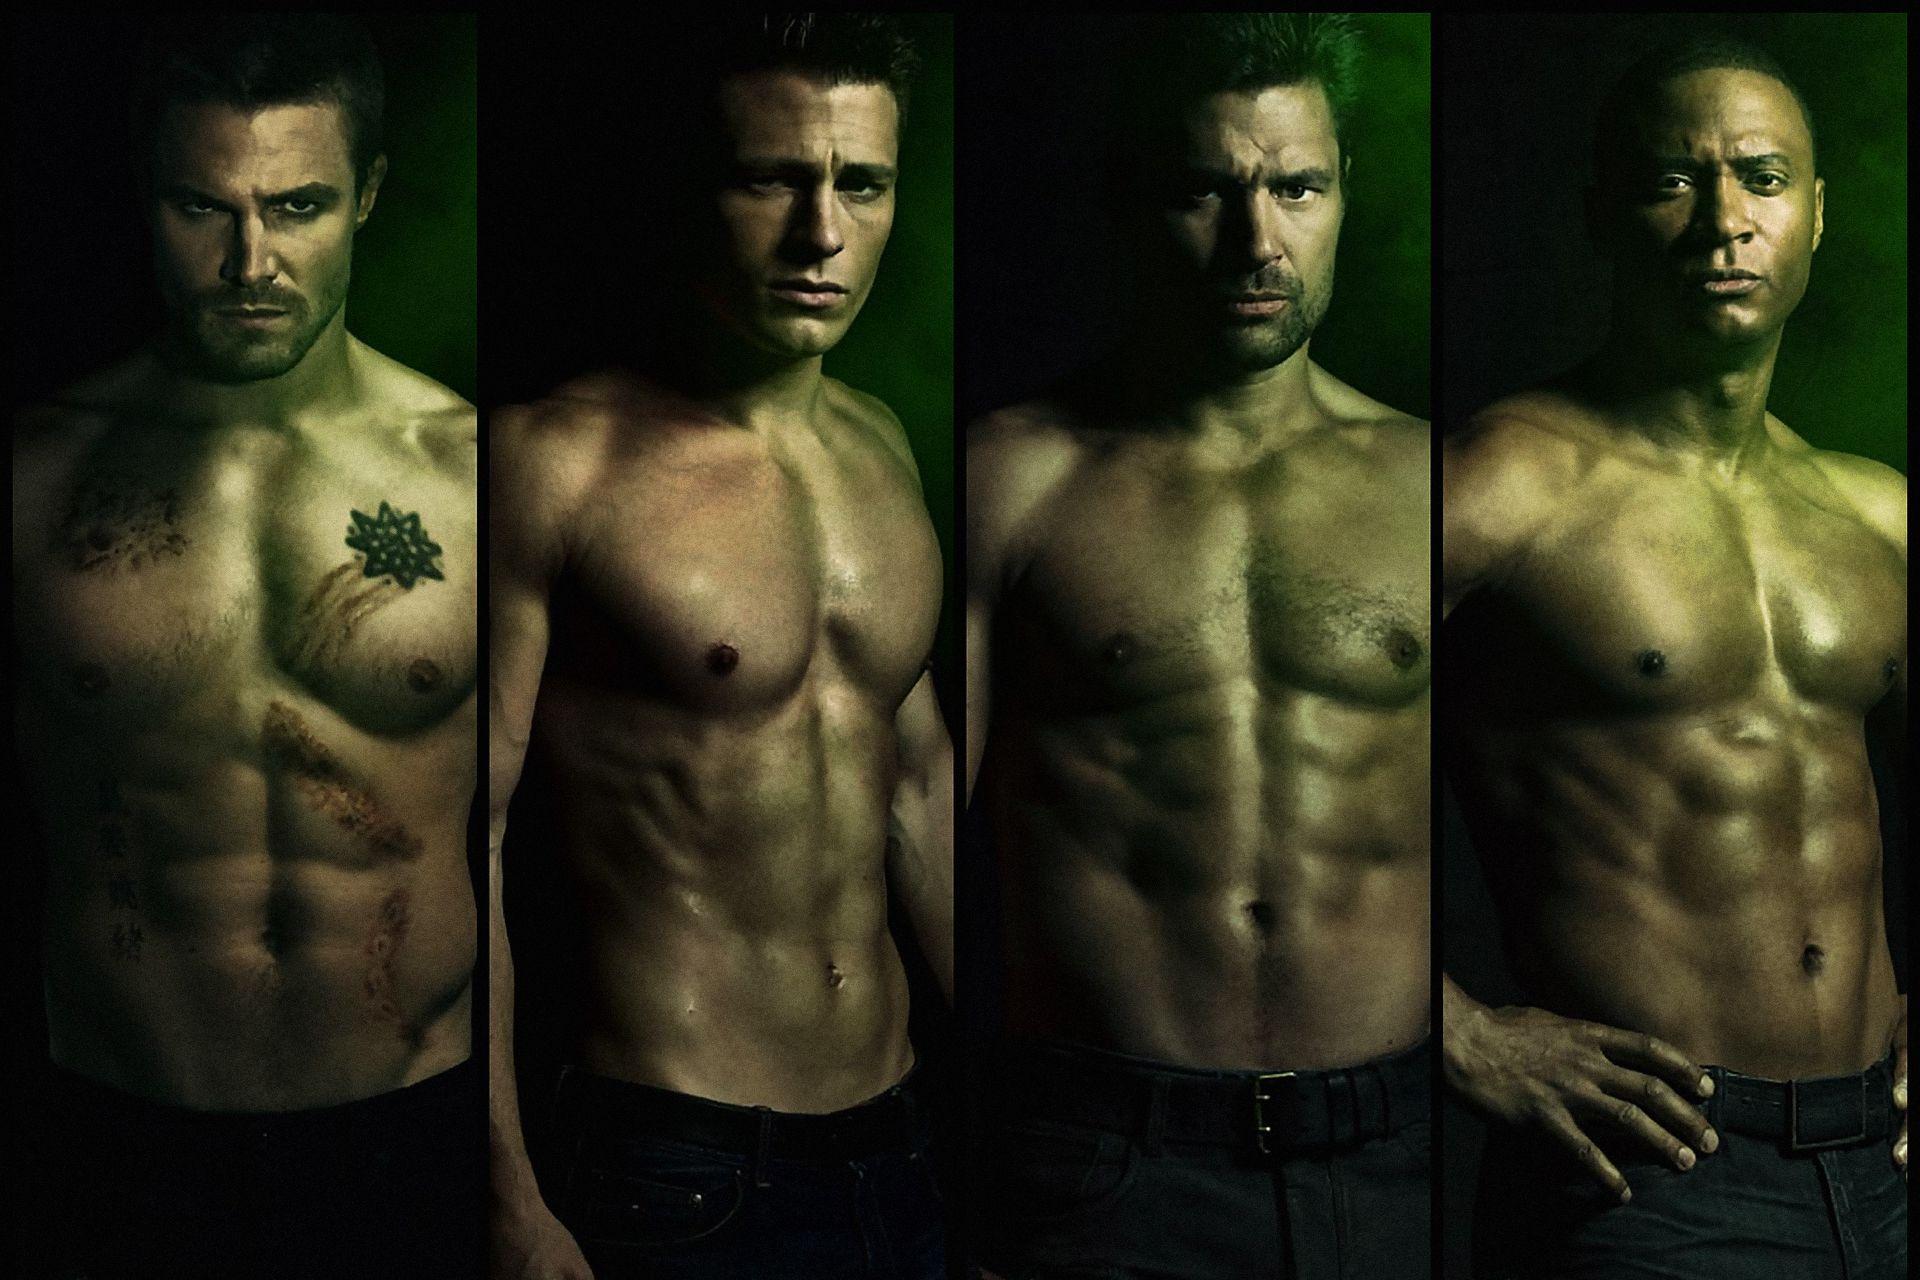 arrow season 2 photos | Arrow season 2 new wallpapers - Movie